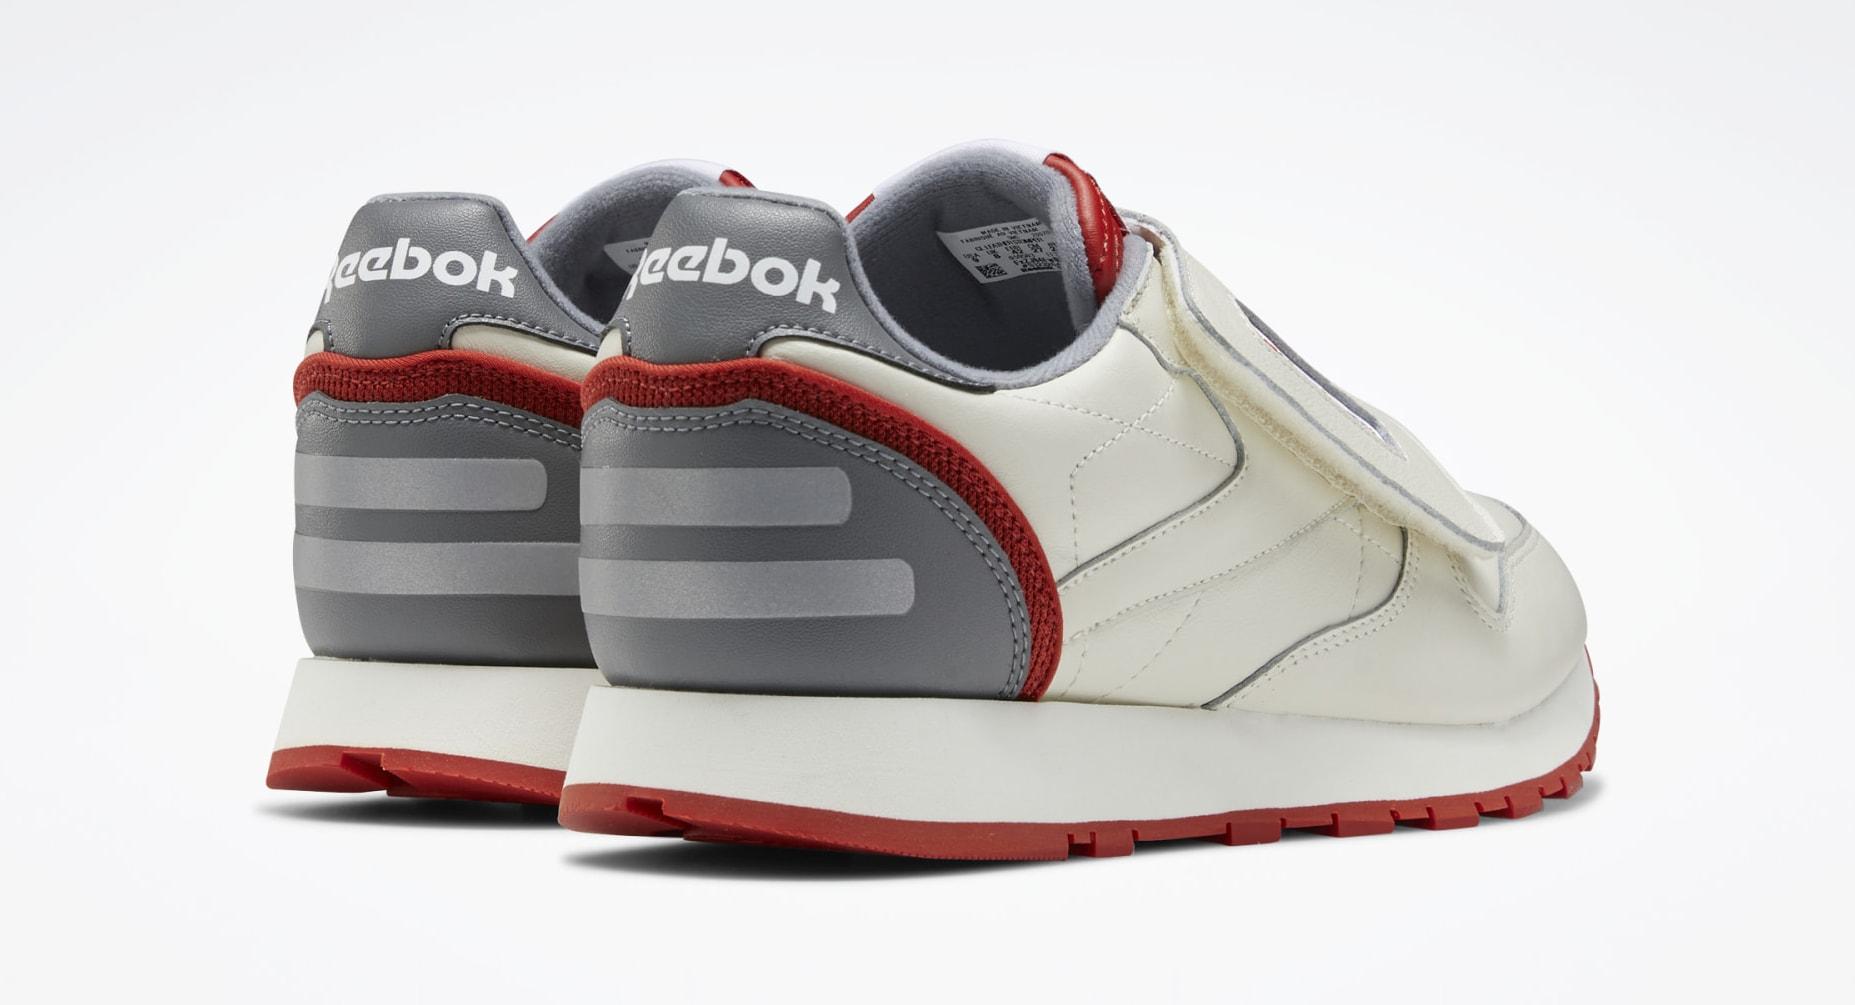 Reebok Classic Leather Stomper EF3374 Heel